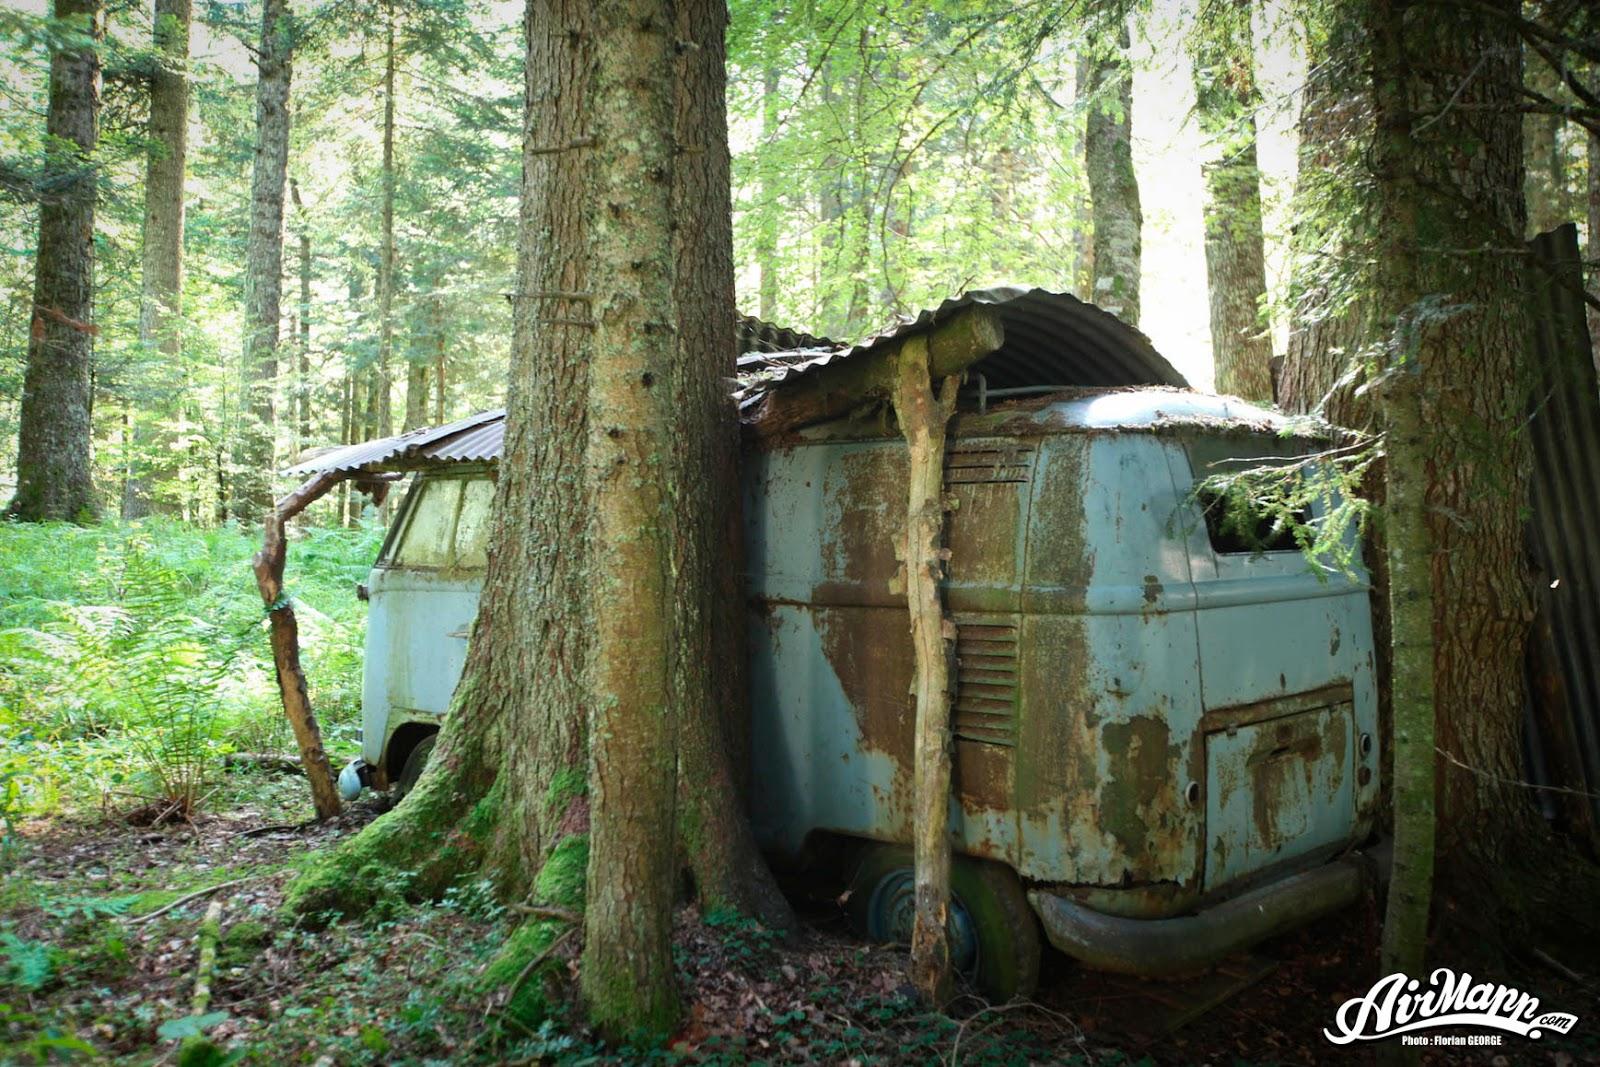 vw2Bmicrobus4 Η απίστευτη ιστορία ενός VW που δούλεψε μετά από 40 χρόνια Caber Van, Camper Van, Fun, VAN, videos, Volkswagen, Volkswagen Microbus, VW, VW Panelvan, VW Transporter, zblog